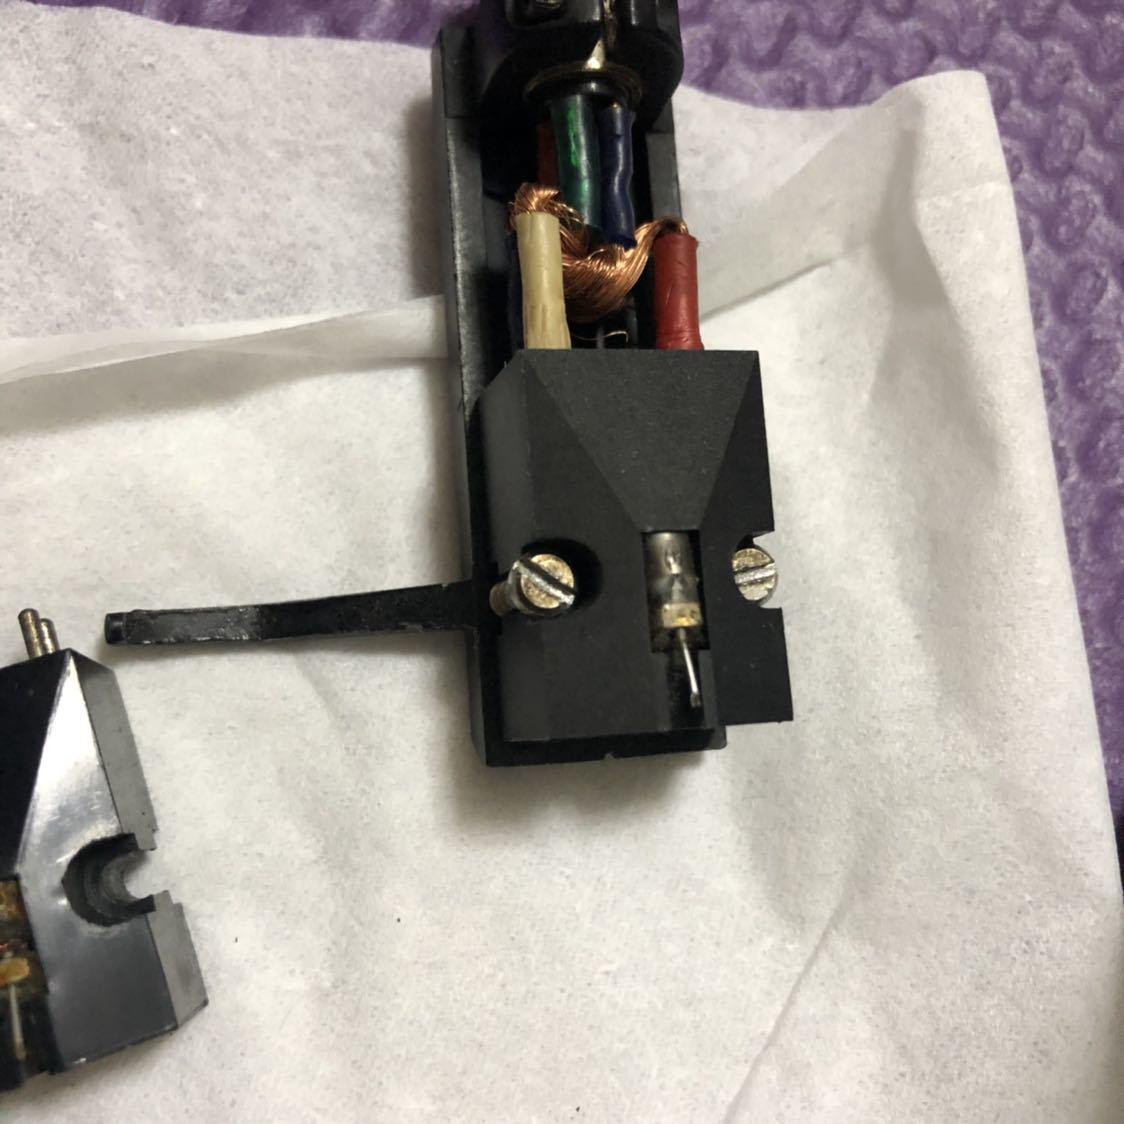 DENON cartridge DL-103 (2 piece ) operation not yet verification